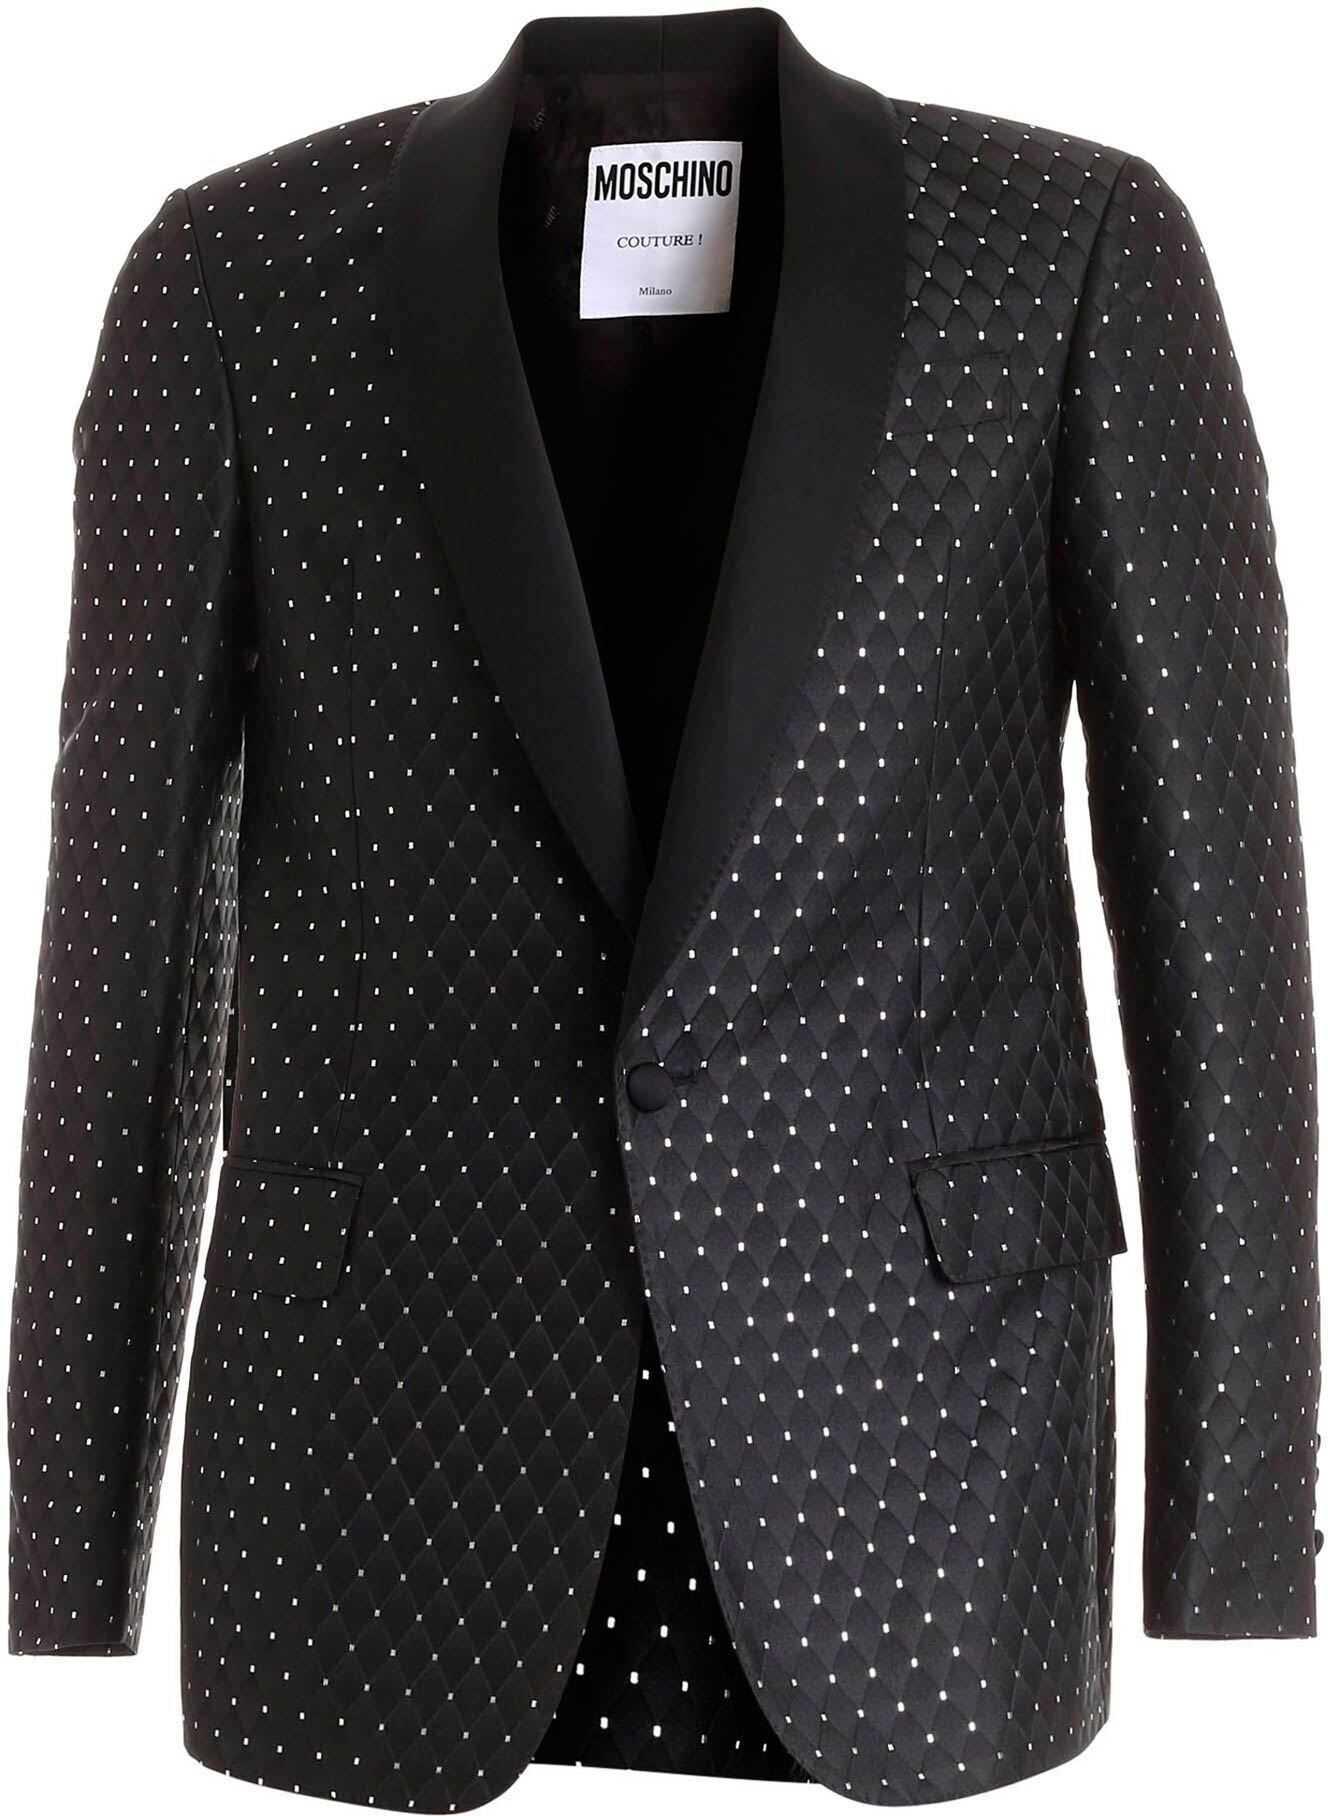 Moschino Jacquard Fabric Black Jacket Featuring Silver Details Black imagine